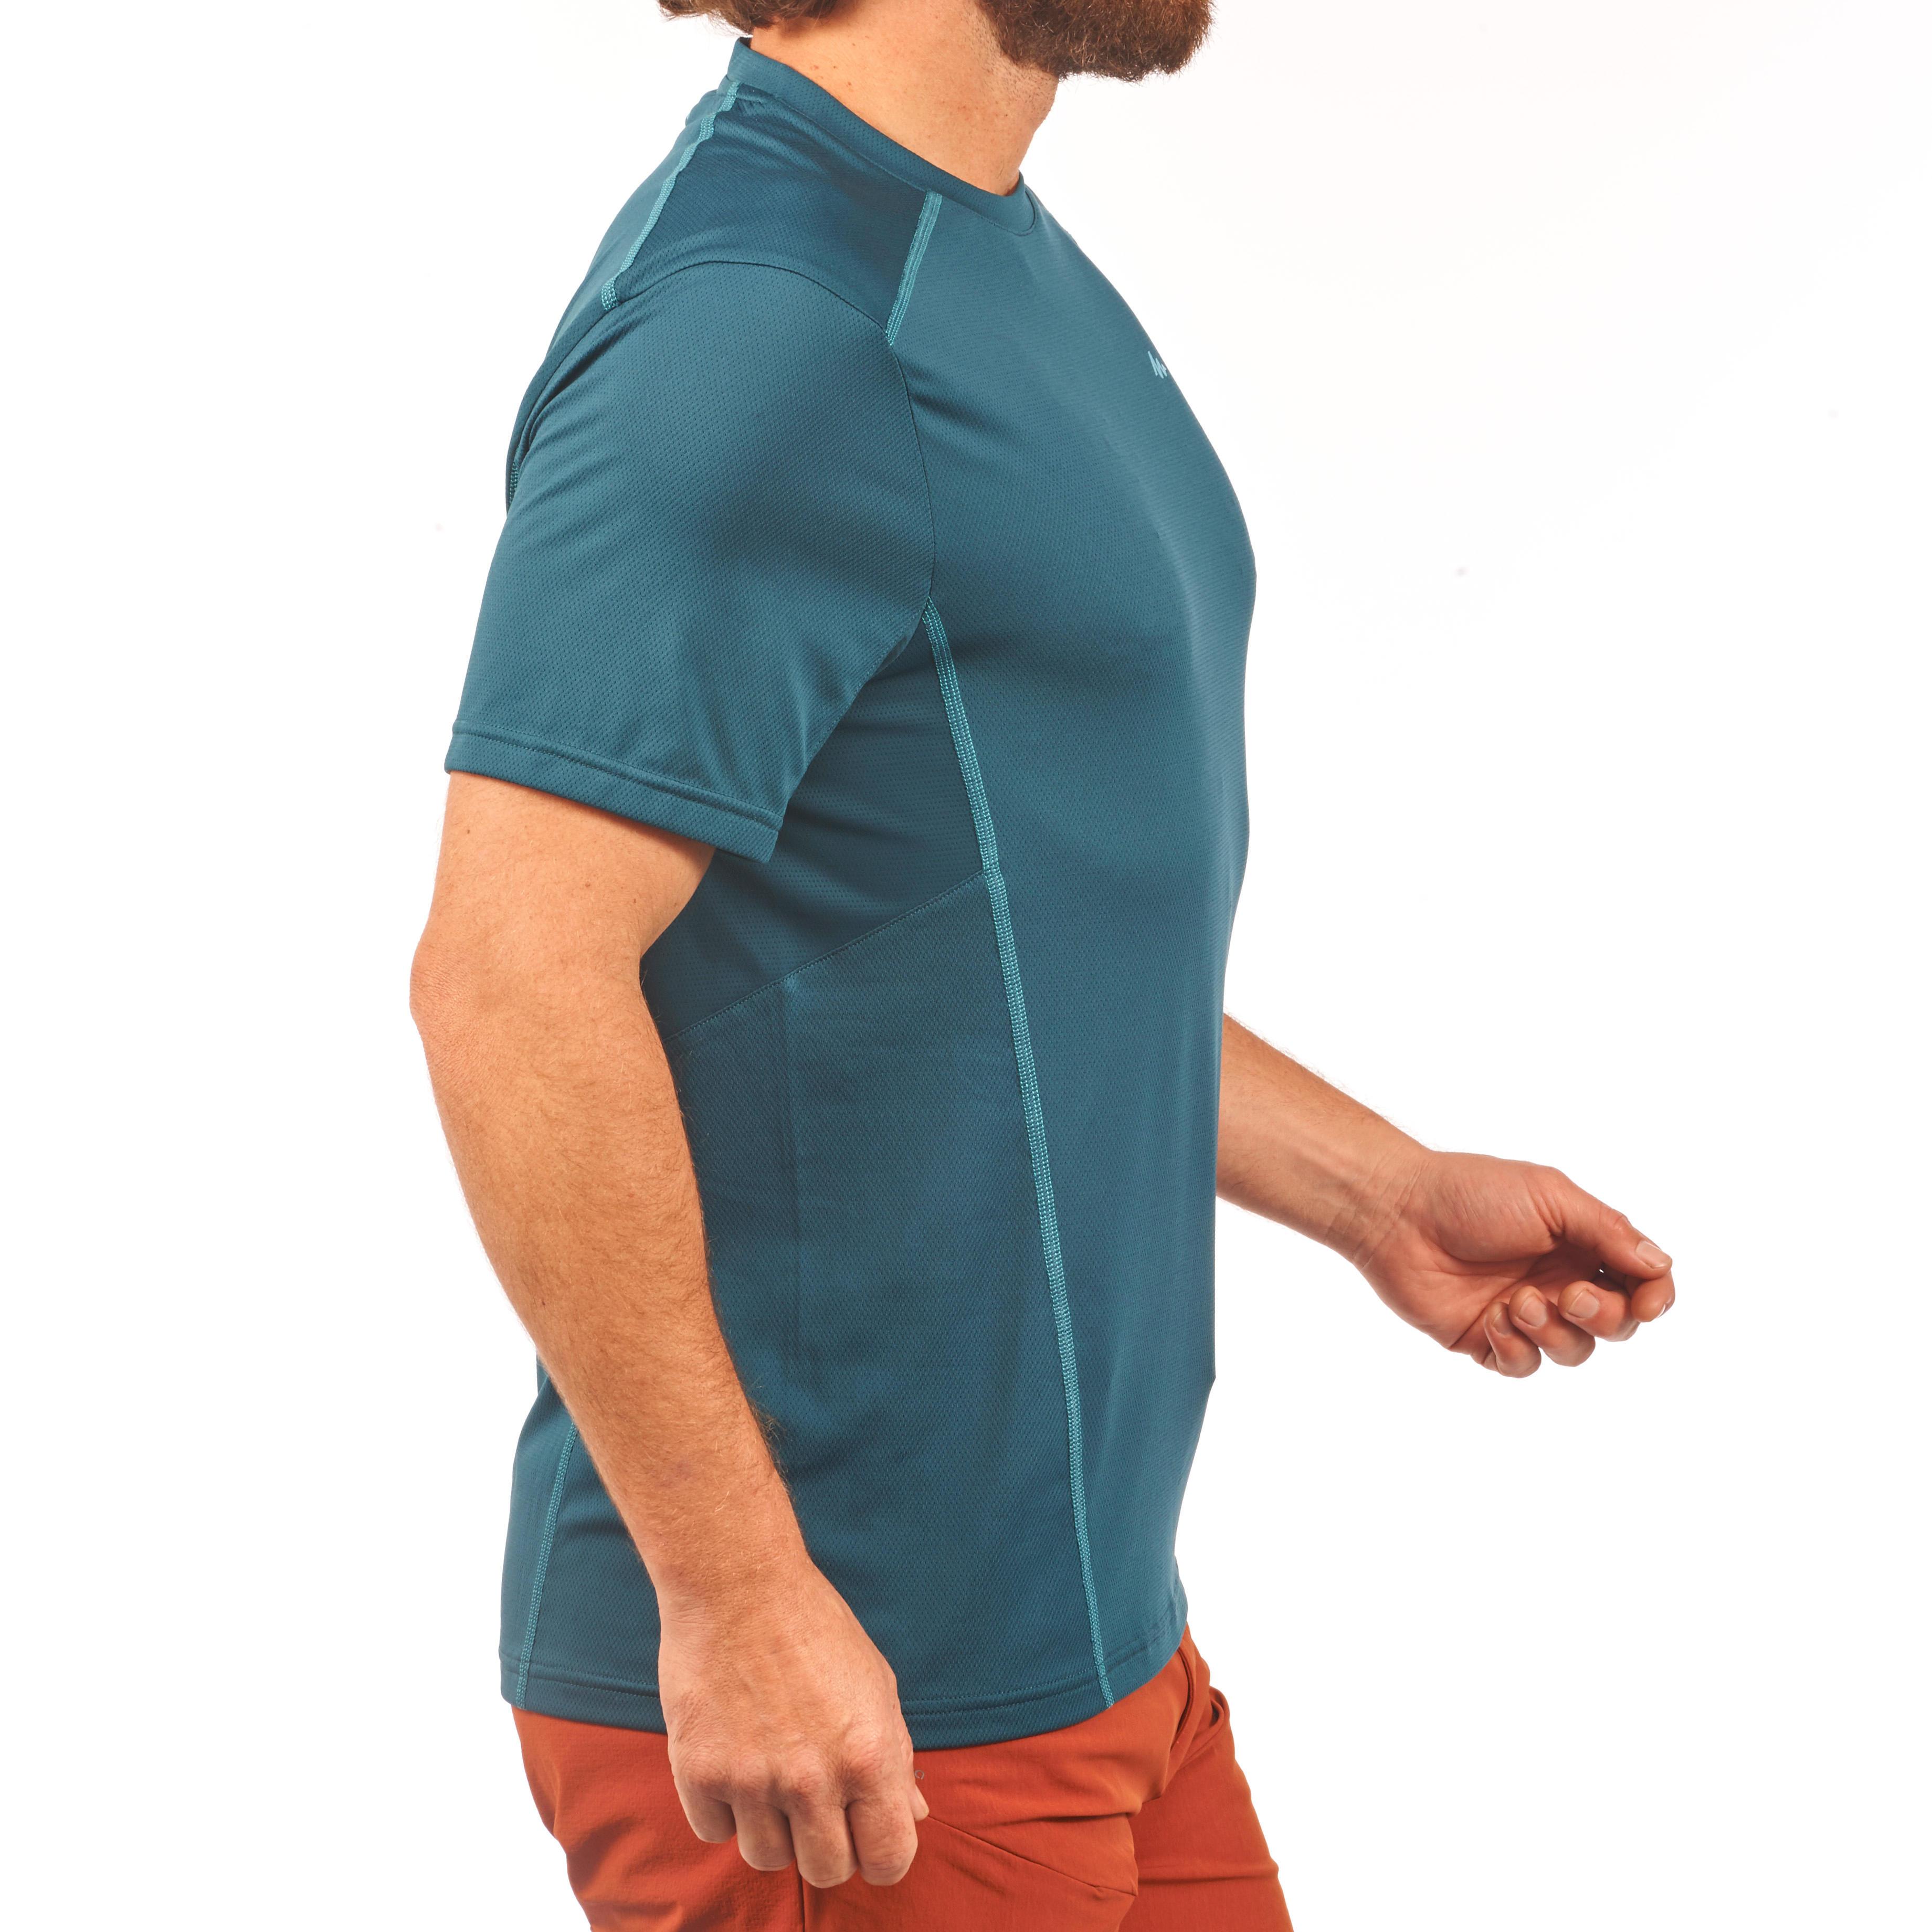 MH500 Men's Short-Sleeved Mountain Hiking T-shirt - Blue